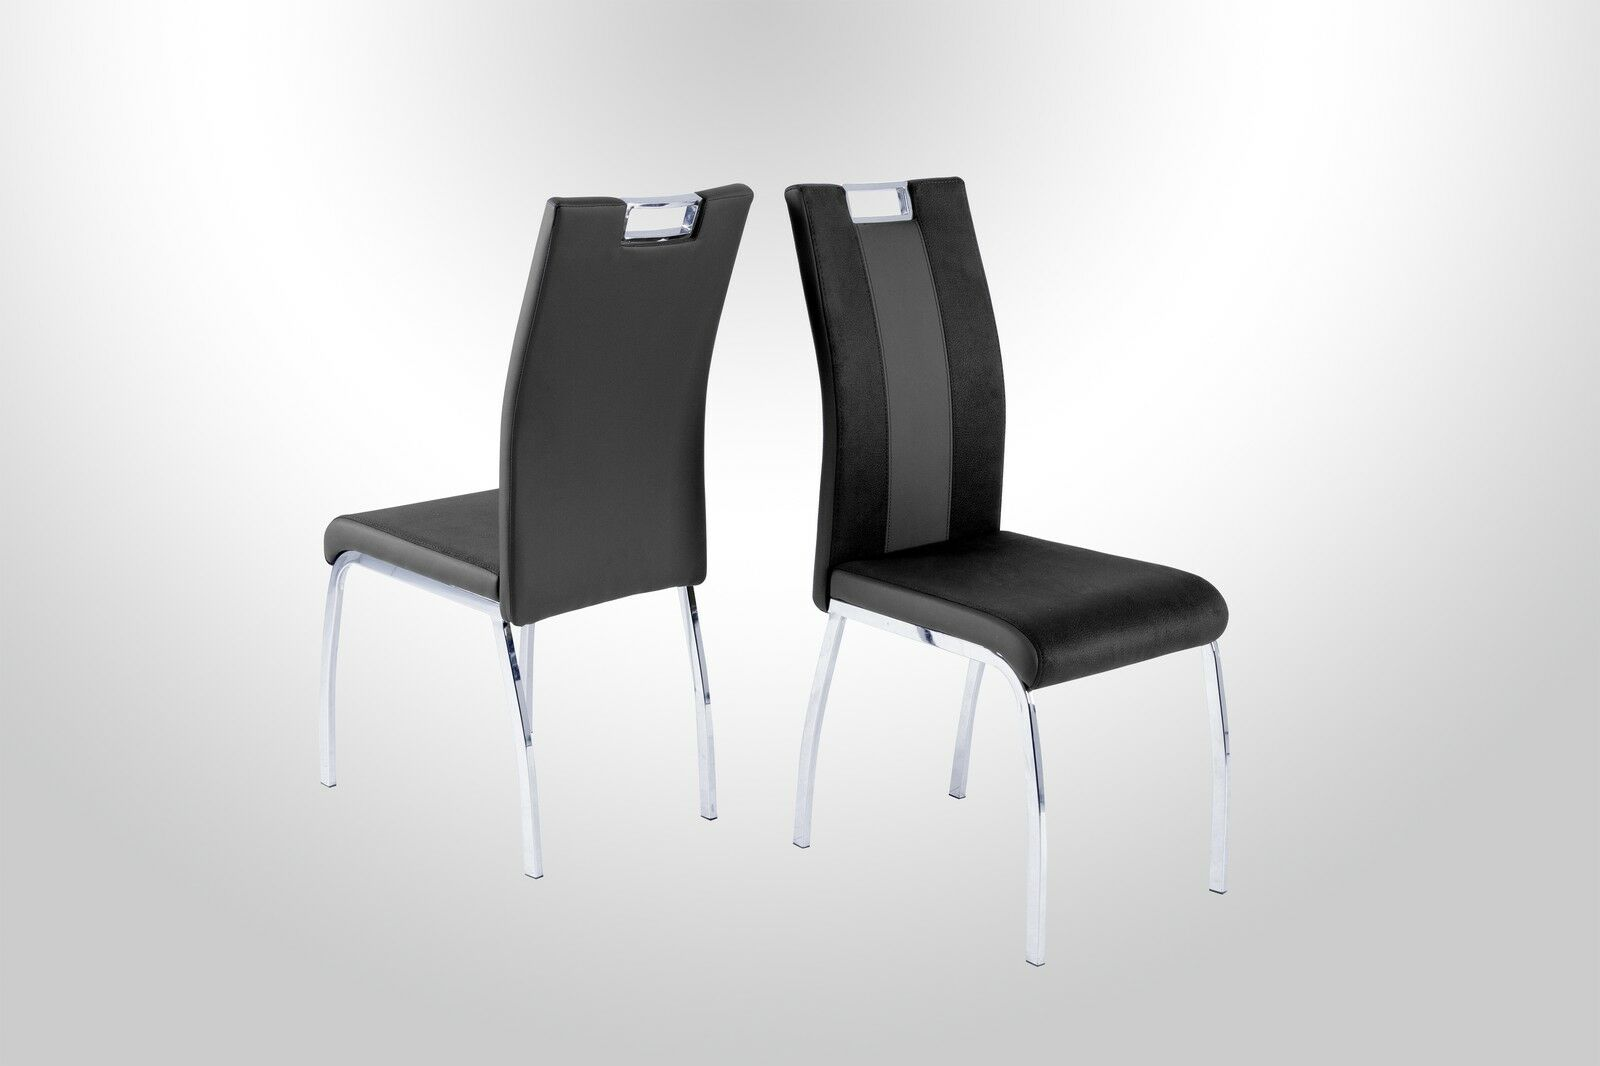 4 X Stuhle Schwarz Grau Kufe Chrom Stuhlset Esszimmer Kuche Modern